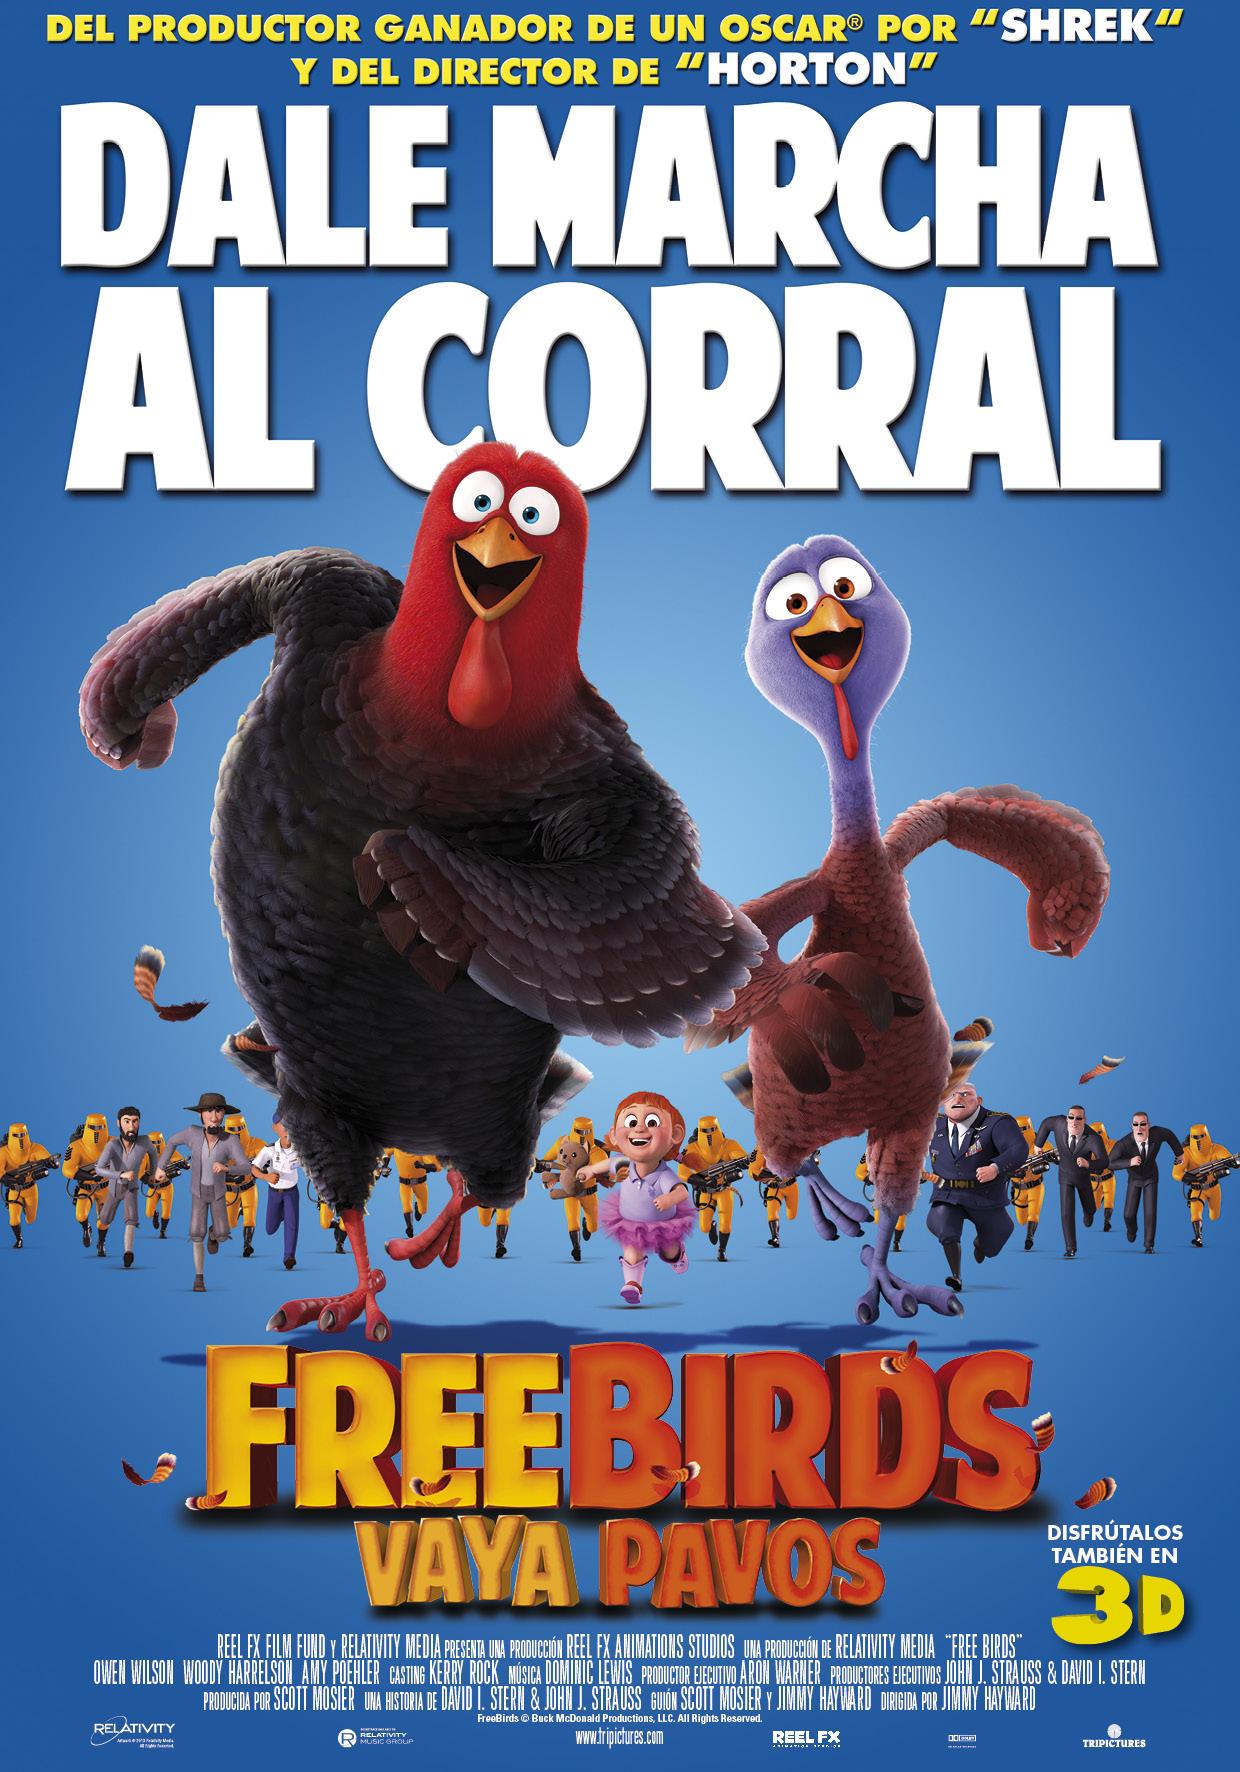 Free Birds, Vaya pavos